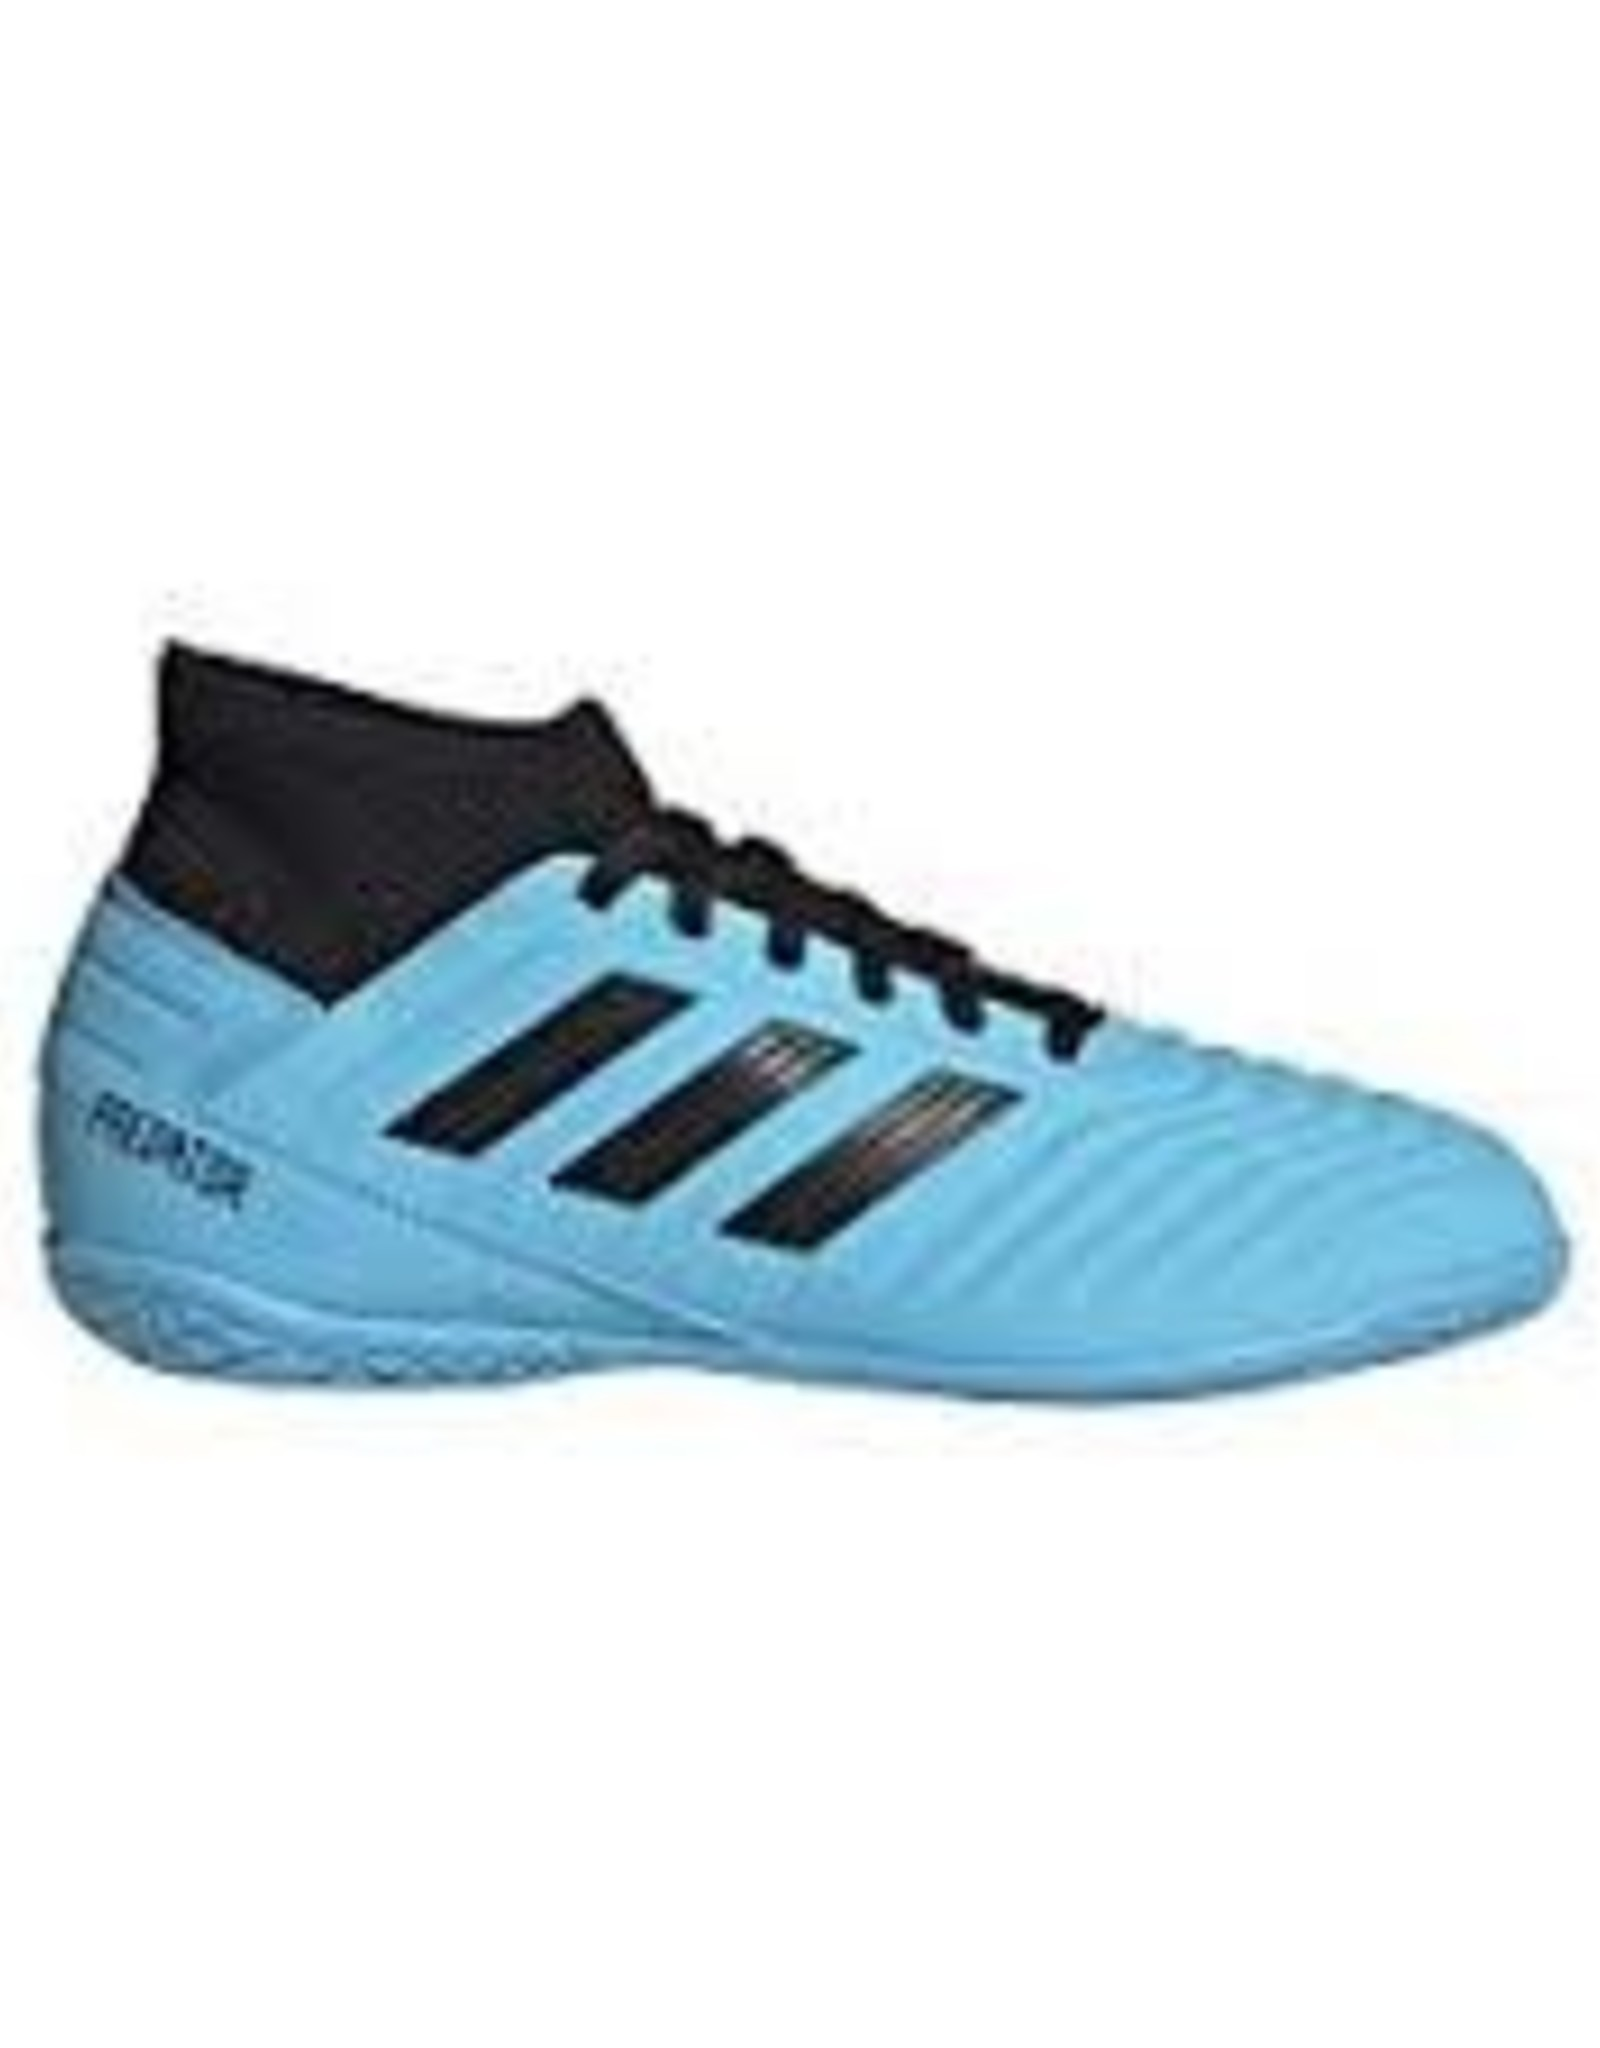 Adidas Adidas IN Predator 19.3 Jr